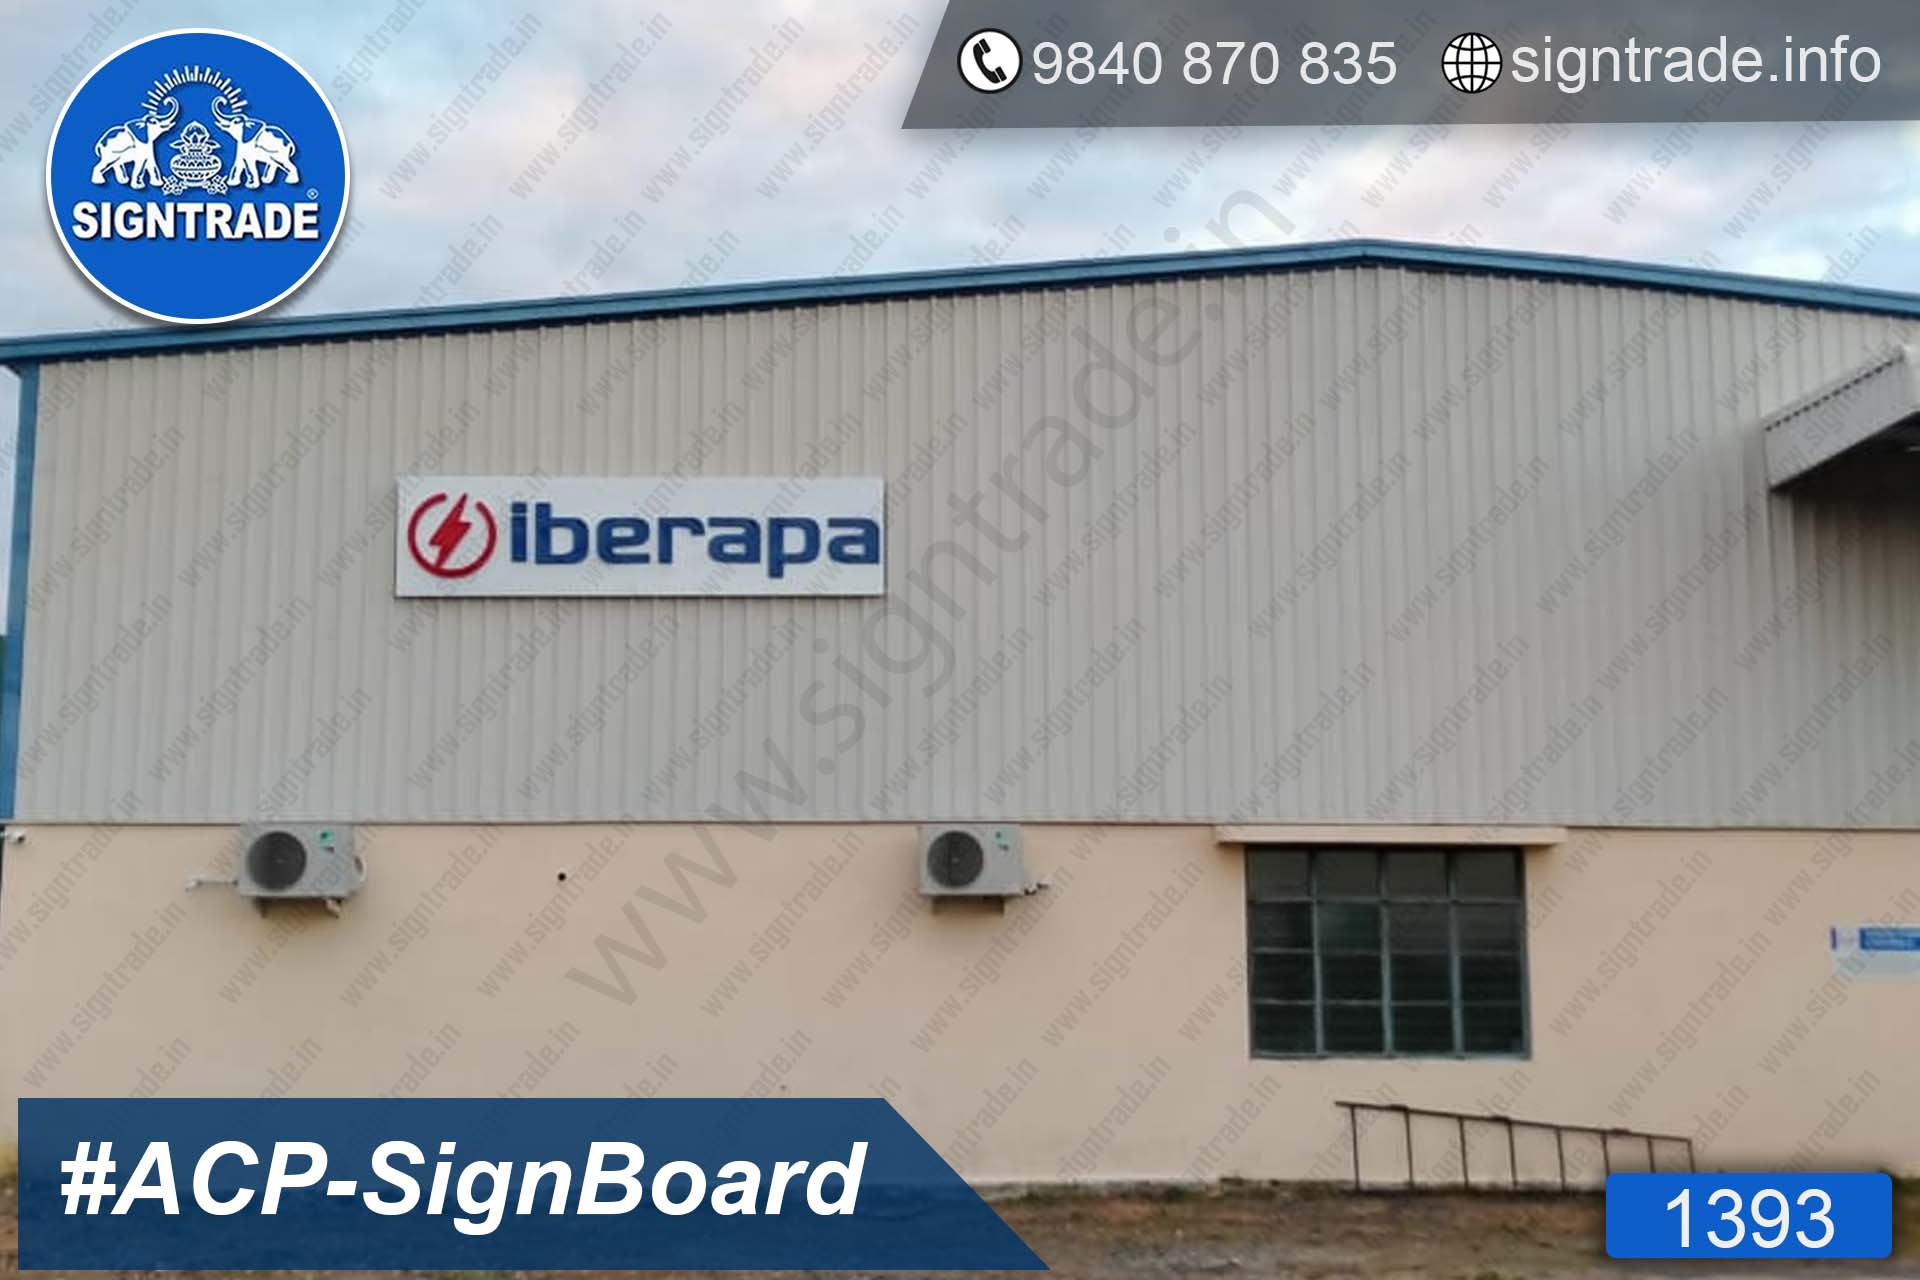 Iberapa India Private Limited - ACP Signboard - 1393, LED Sign Board, Sign Board, Acrylic Sign Board, Glow Sign Board, Custom Sign Board